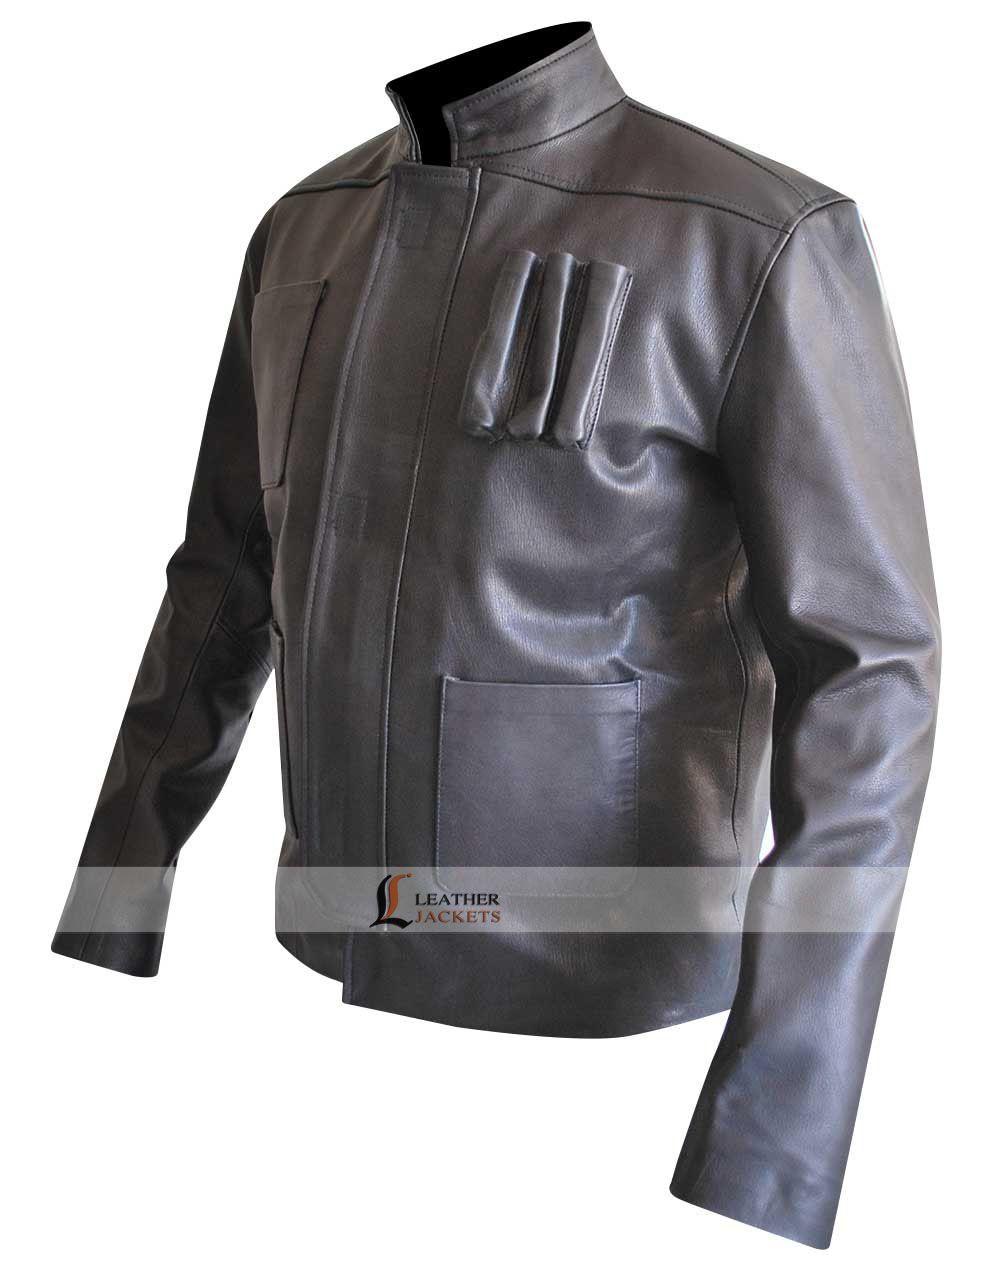 Get Blasting Movie Star Wars Force Awakens Han Solo Jacket In Two Colours Han Solo Jacket Brown Jacket Jackets [ 1273 x 1000 Pixel ]